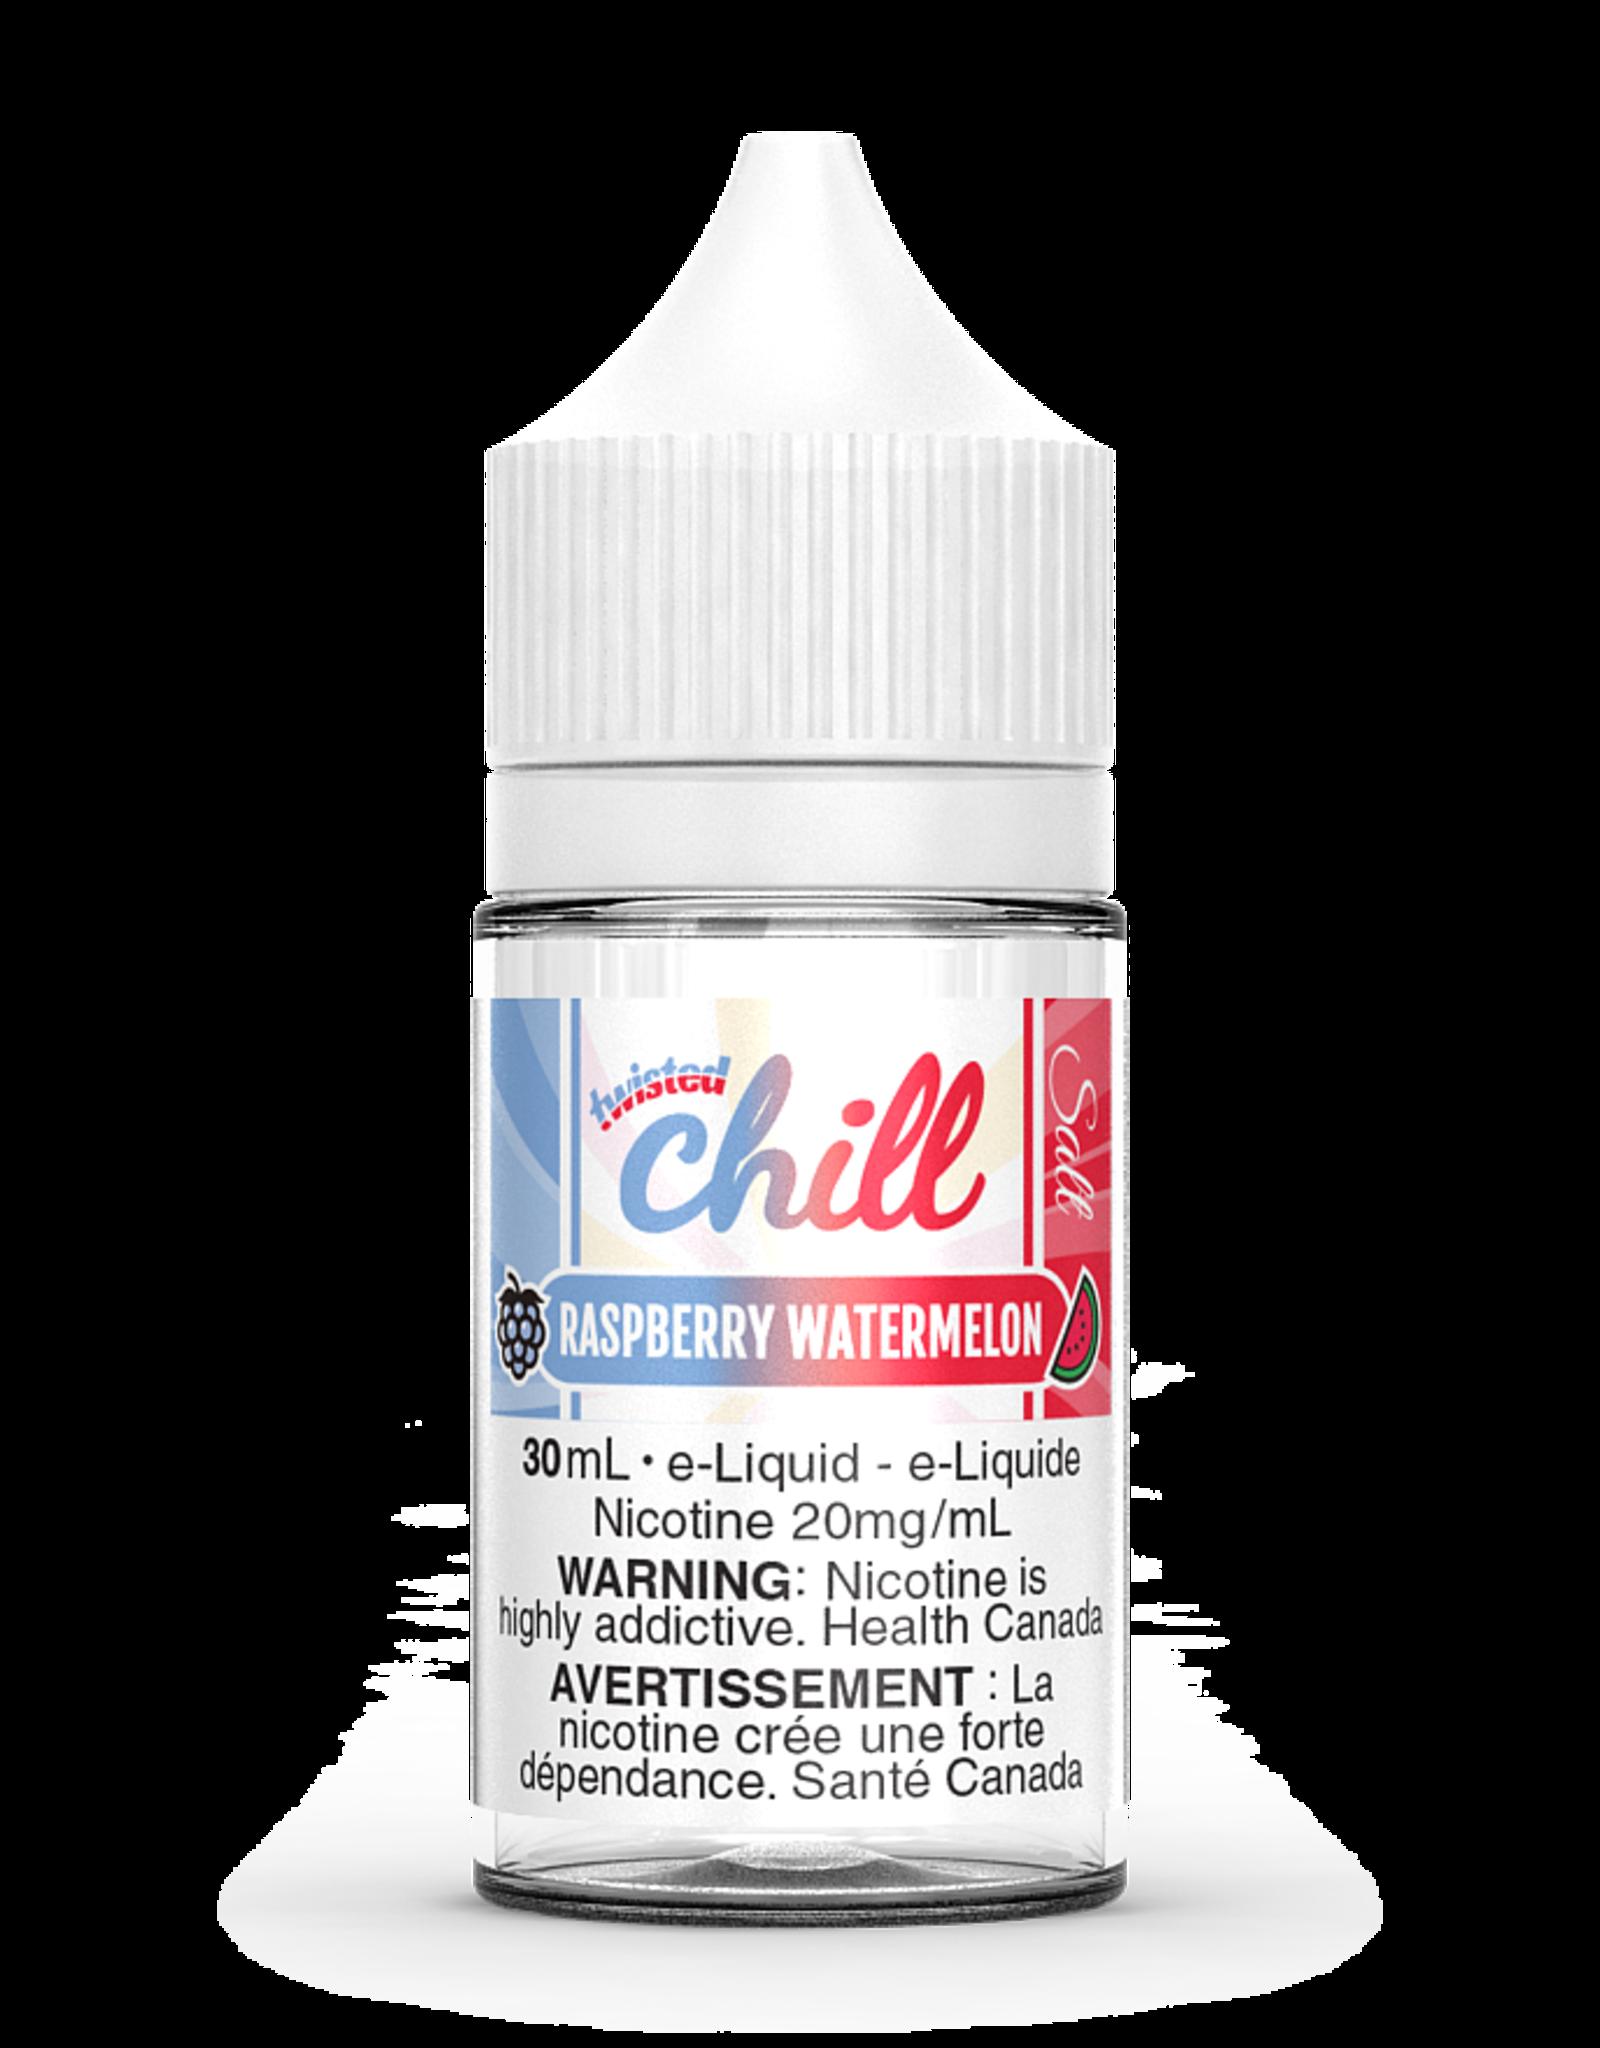 CHILL SALT RASPBERRY WATERMELON SALT BY CHILL TWISTED (SALT) BY CHILL E-LIQUIDS(30ml)